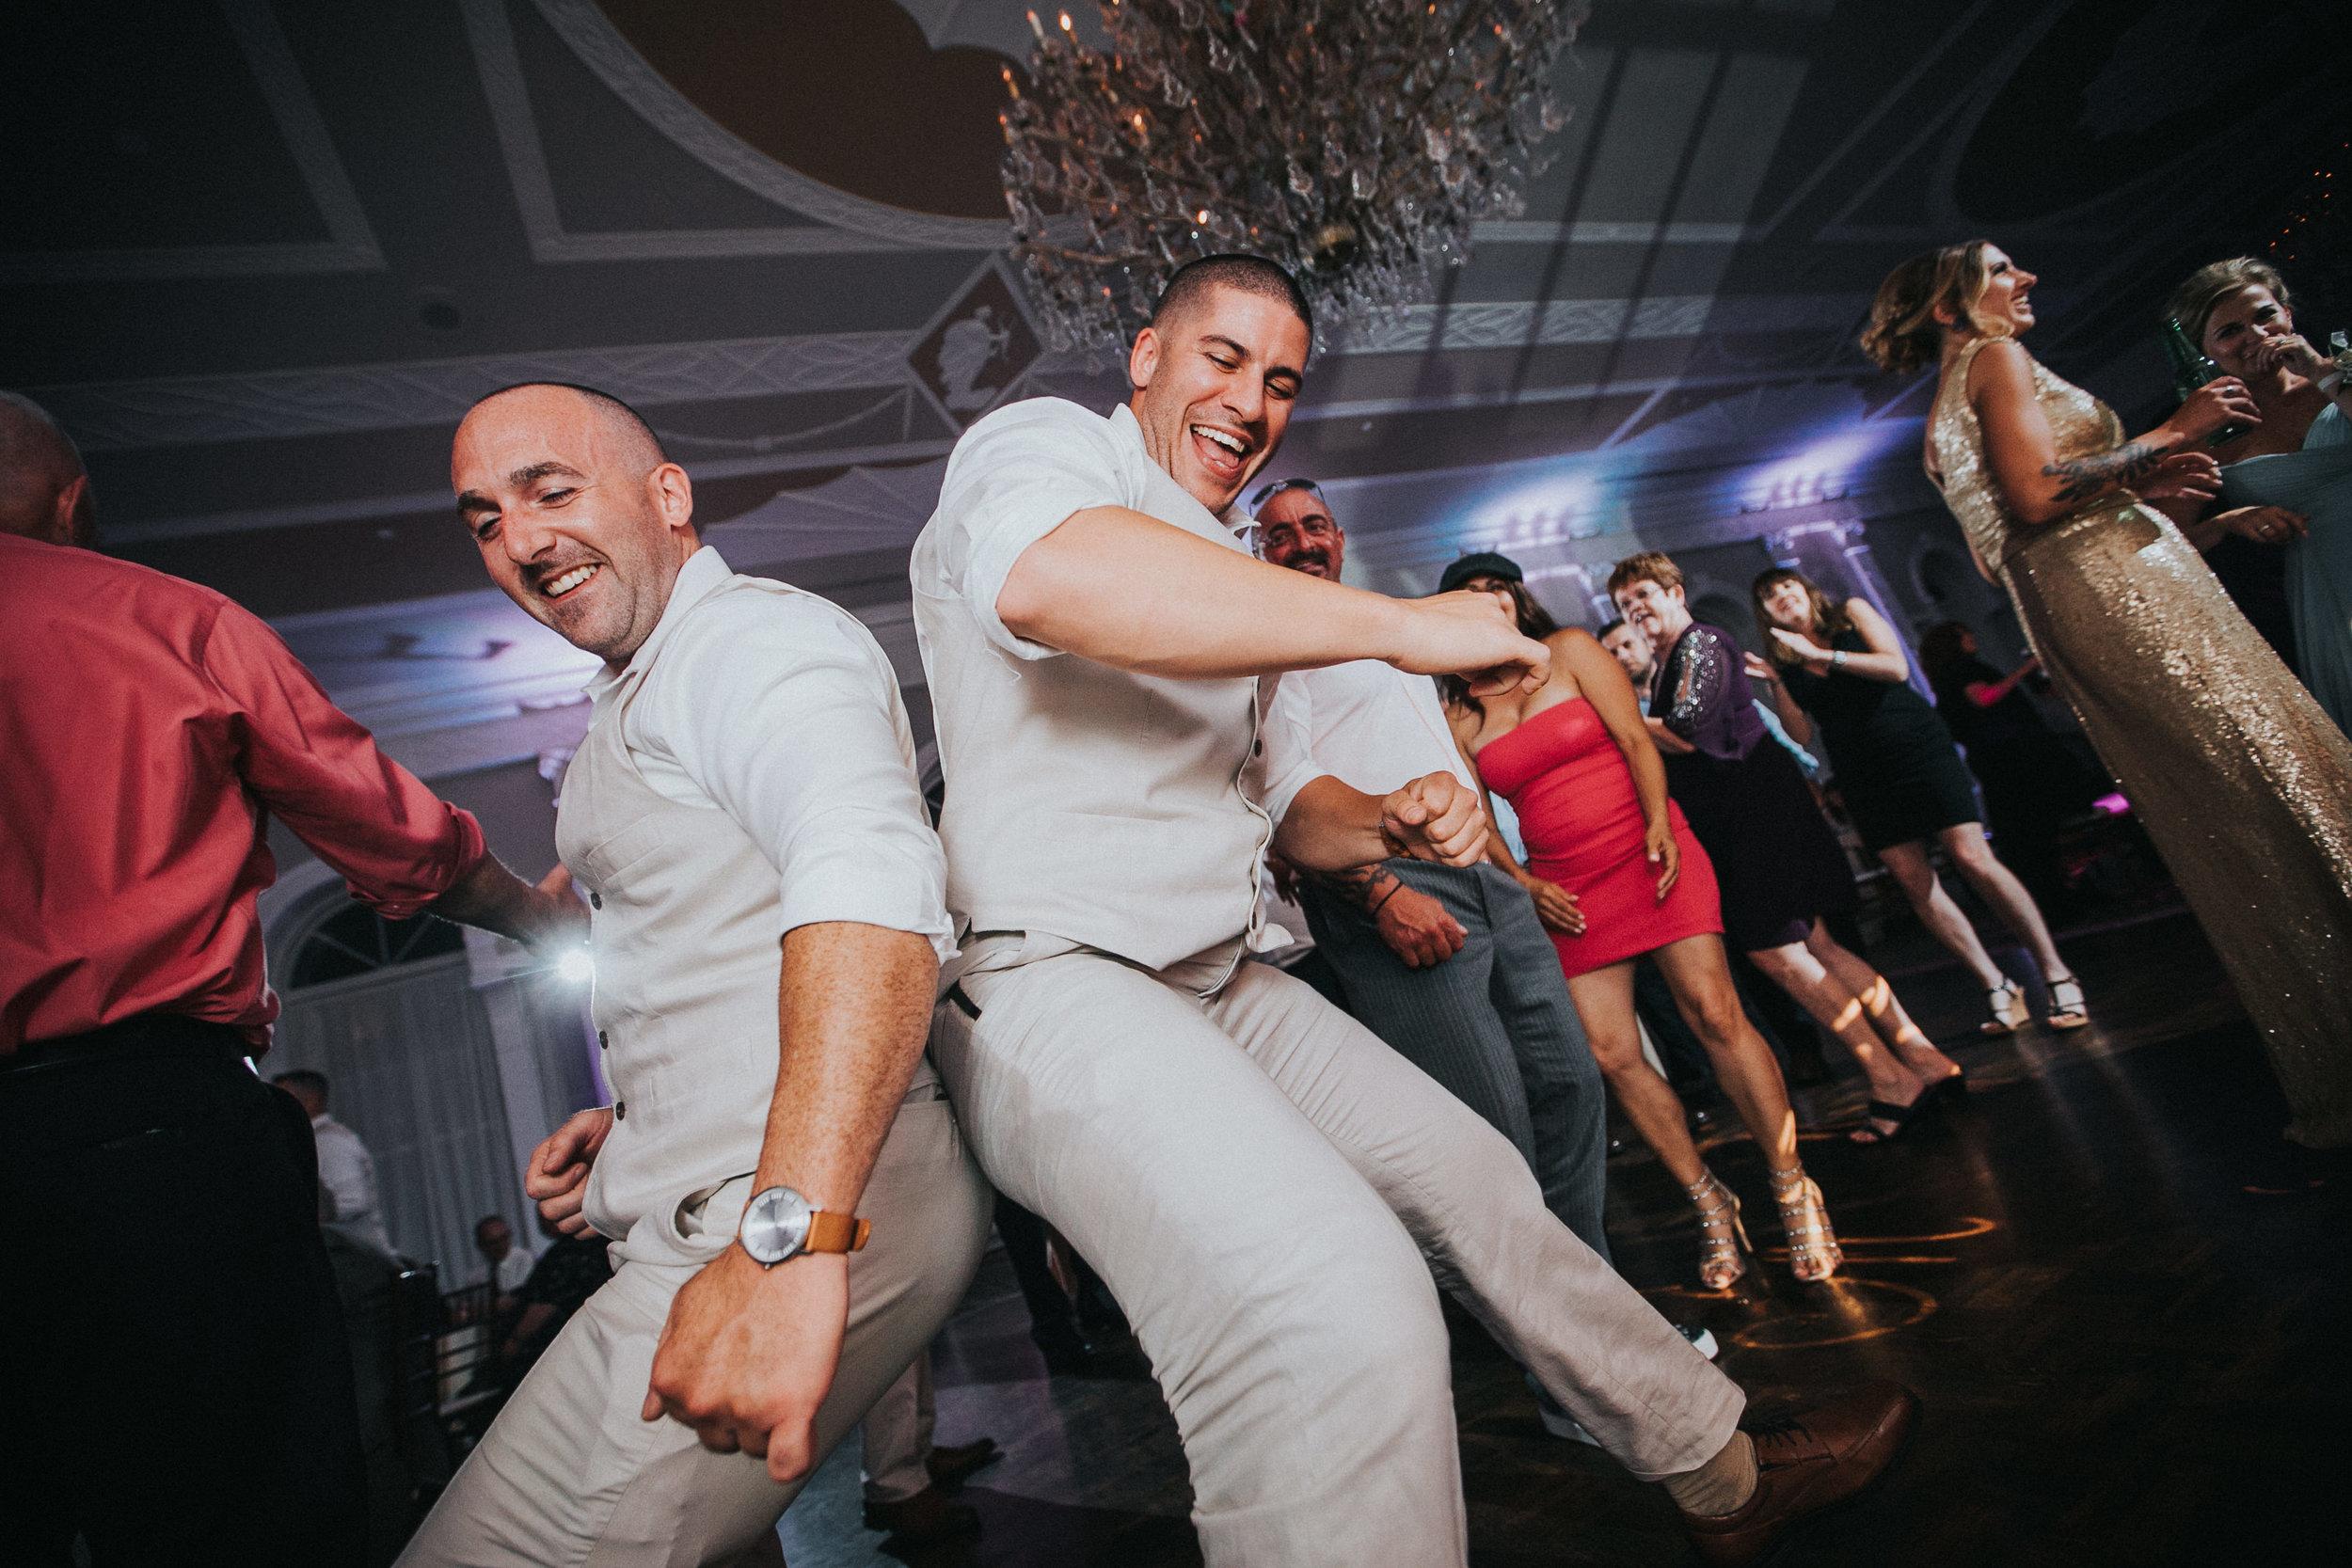 JennaLynnPhotography-NJWeddingPhotographer-Wedding-TheBerkeley-AsburyPark-Allison&Michael-Reception-183.jpg